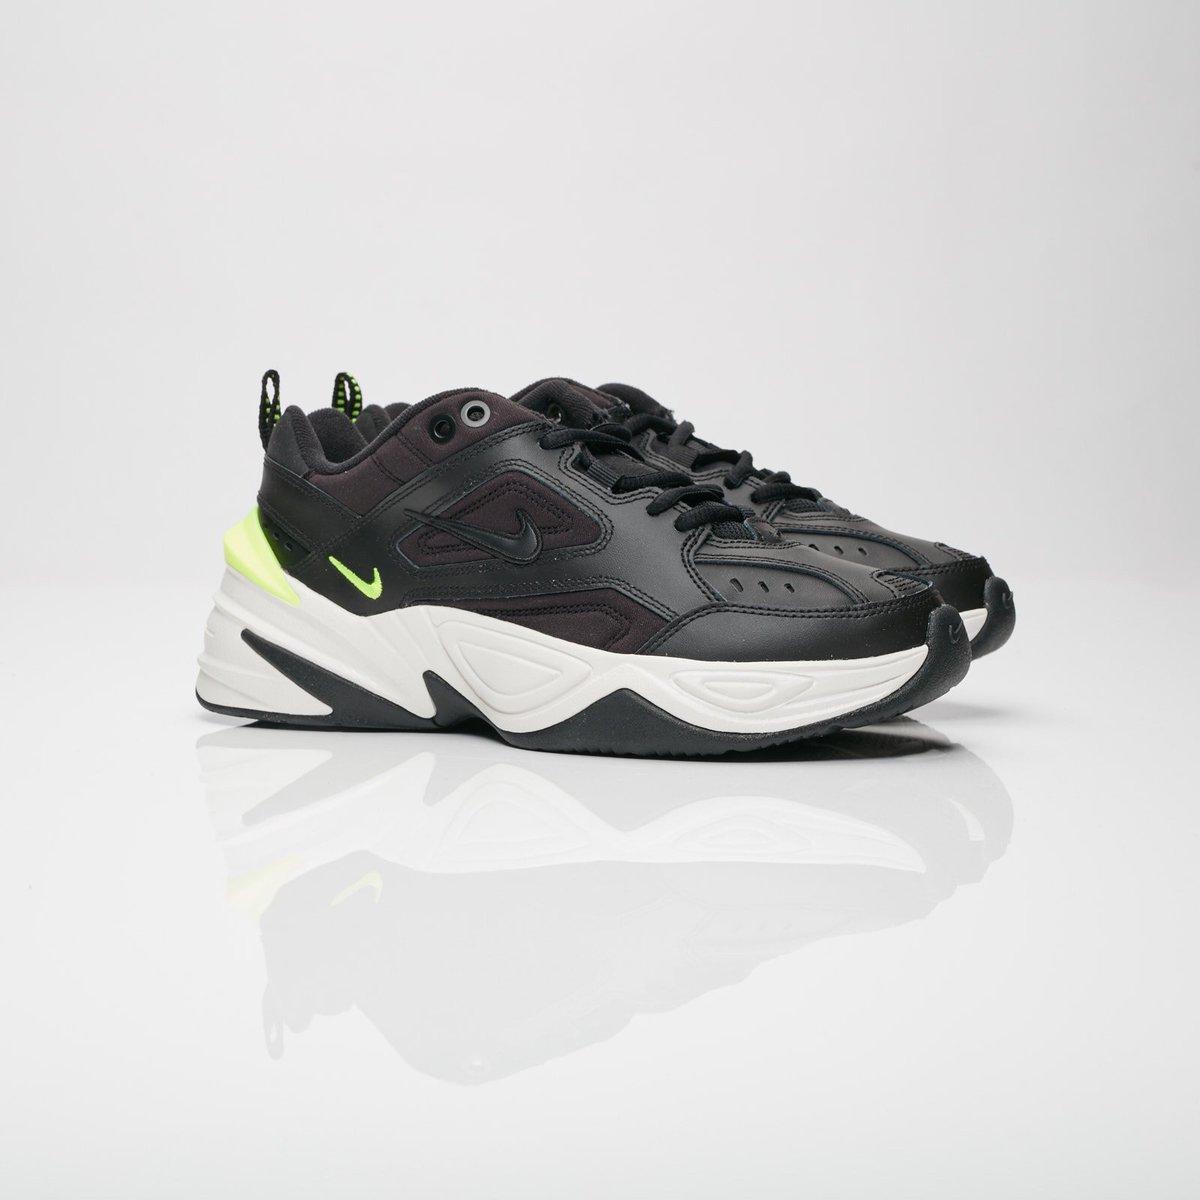 Releasing in 10 minutes Women's Nike M2K Tekno SNS:http://bit.ly/2FnFnql  FD:http://bit.ly/2Fo7qWz pic.twitter.com/YANGbwMc8n